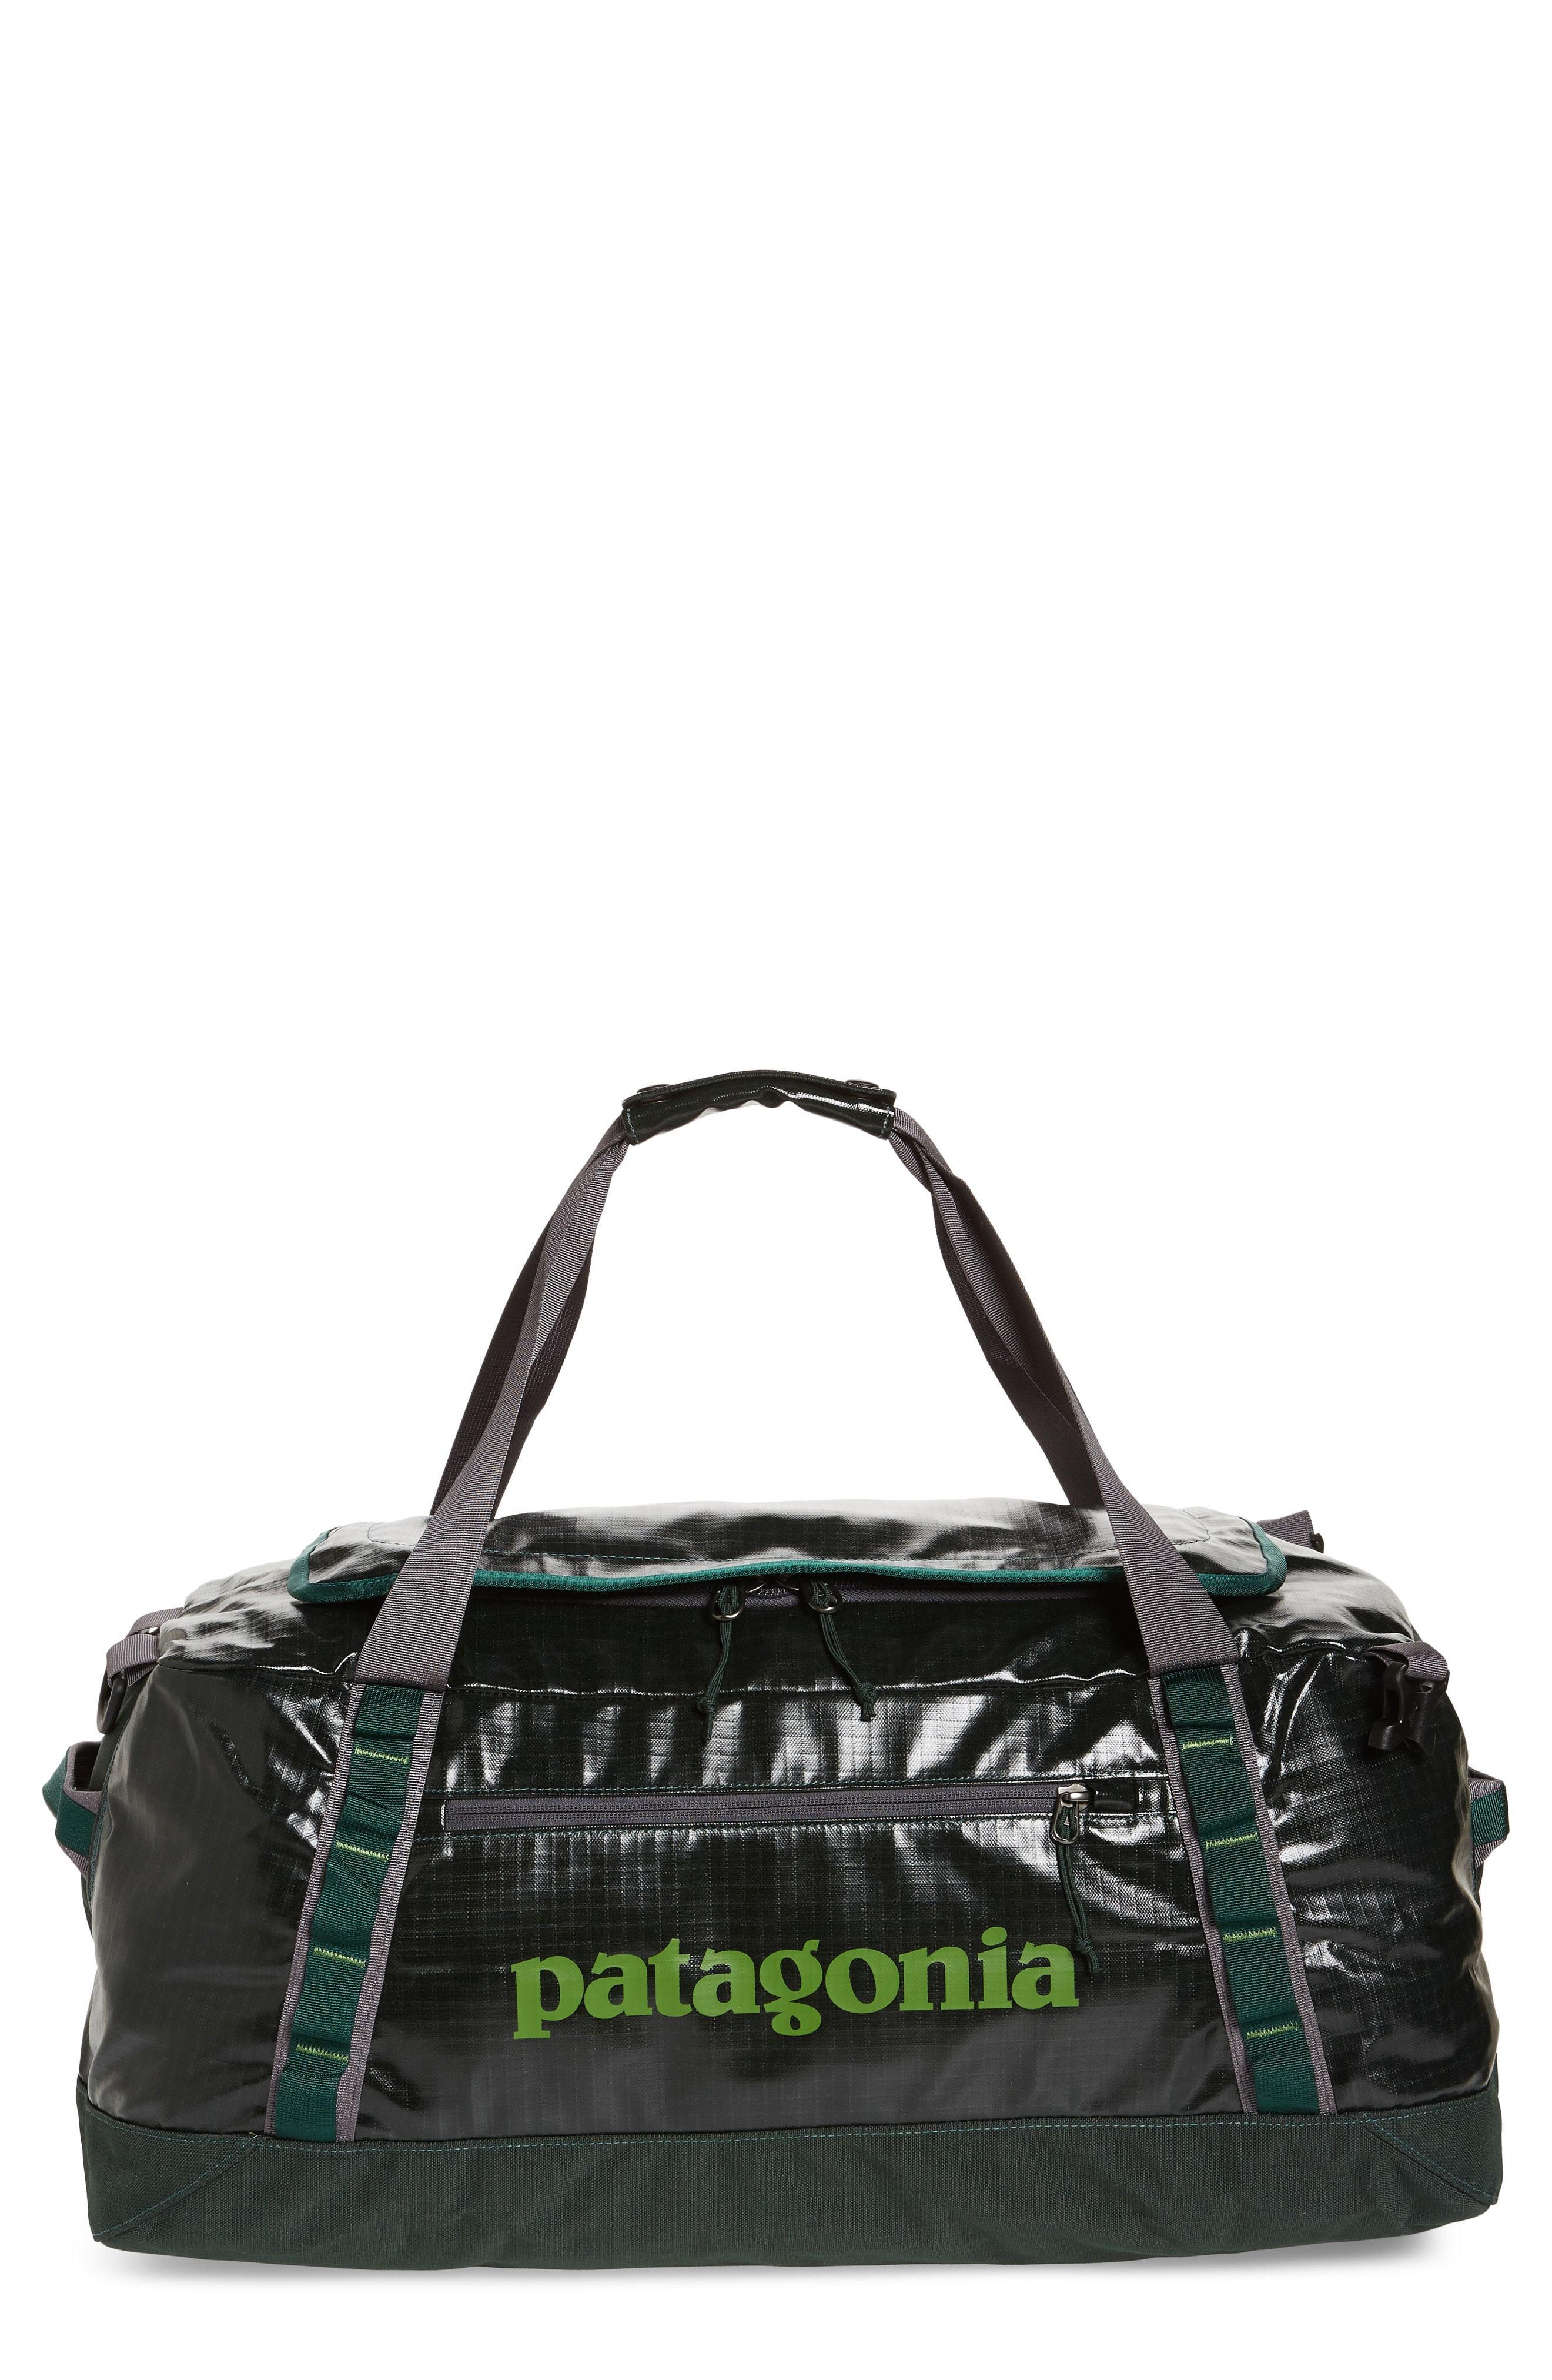 335b4c7f12f Patagonia Black Hole Water Repellent Duffel Bag, $129 | Nordstrom ...